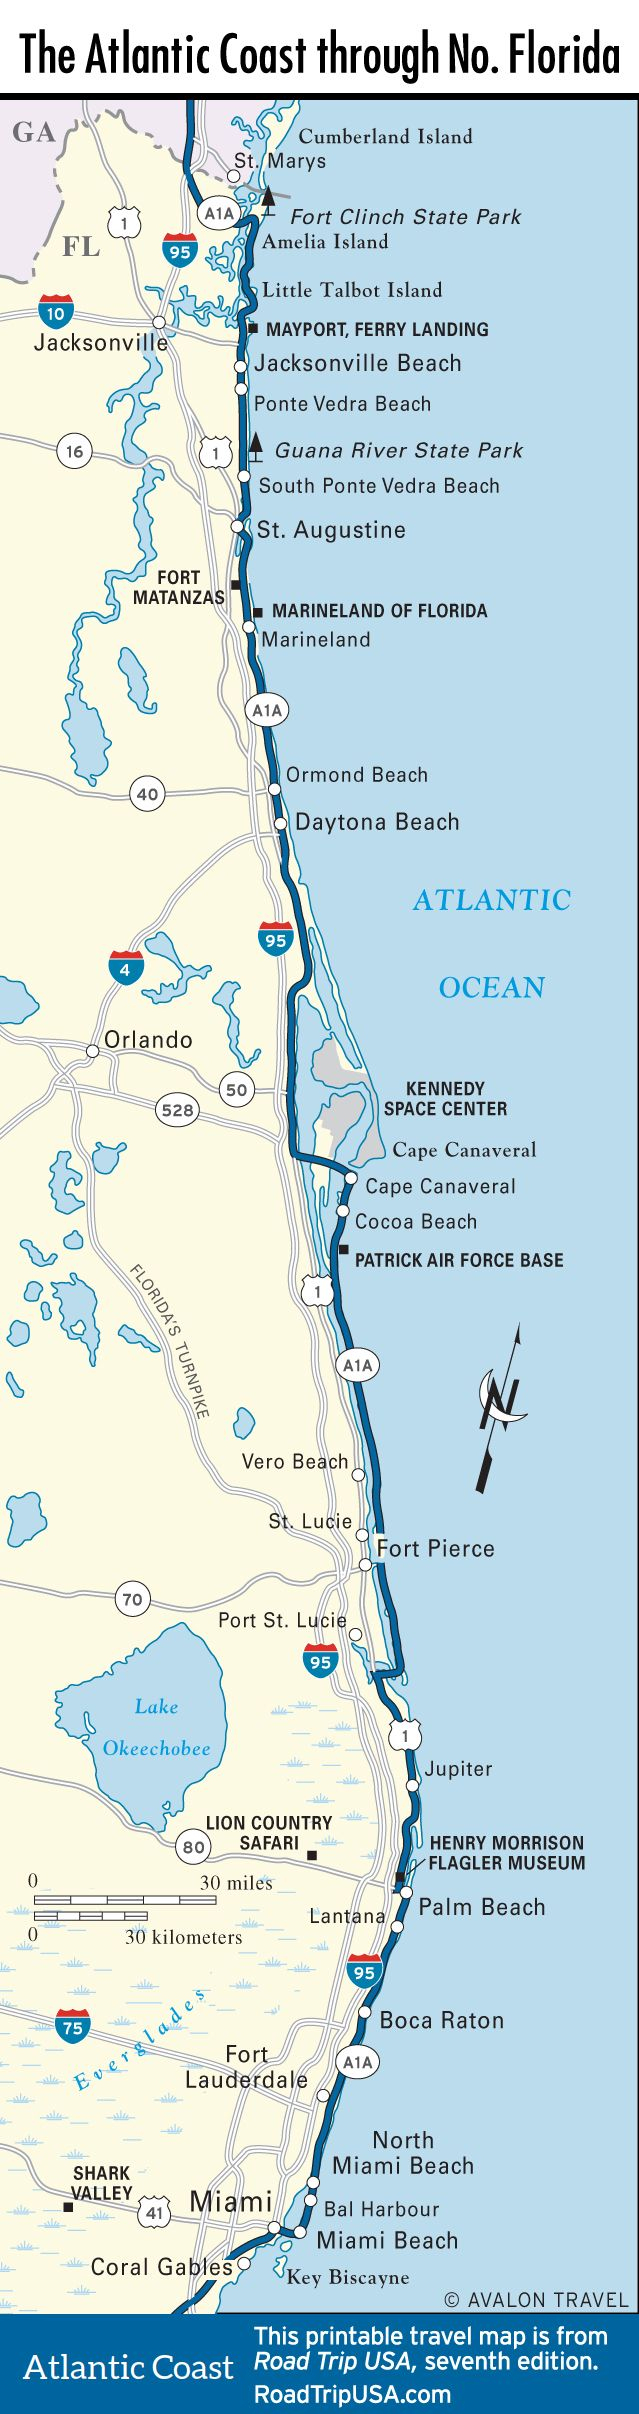 Map Of The Atlantic Coast Through Northern Florida. | Florida A1A - Map Of Eastern Florida Beaches